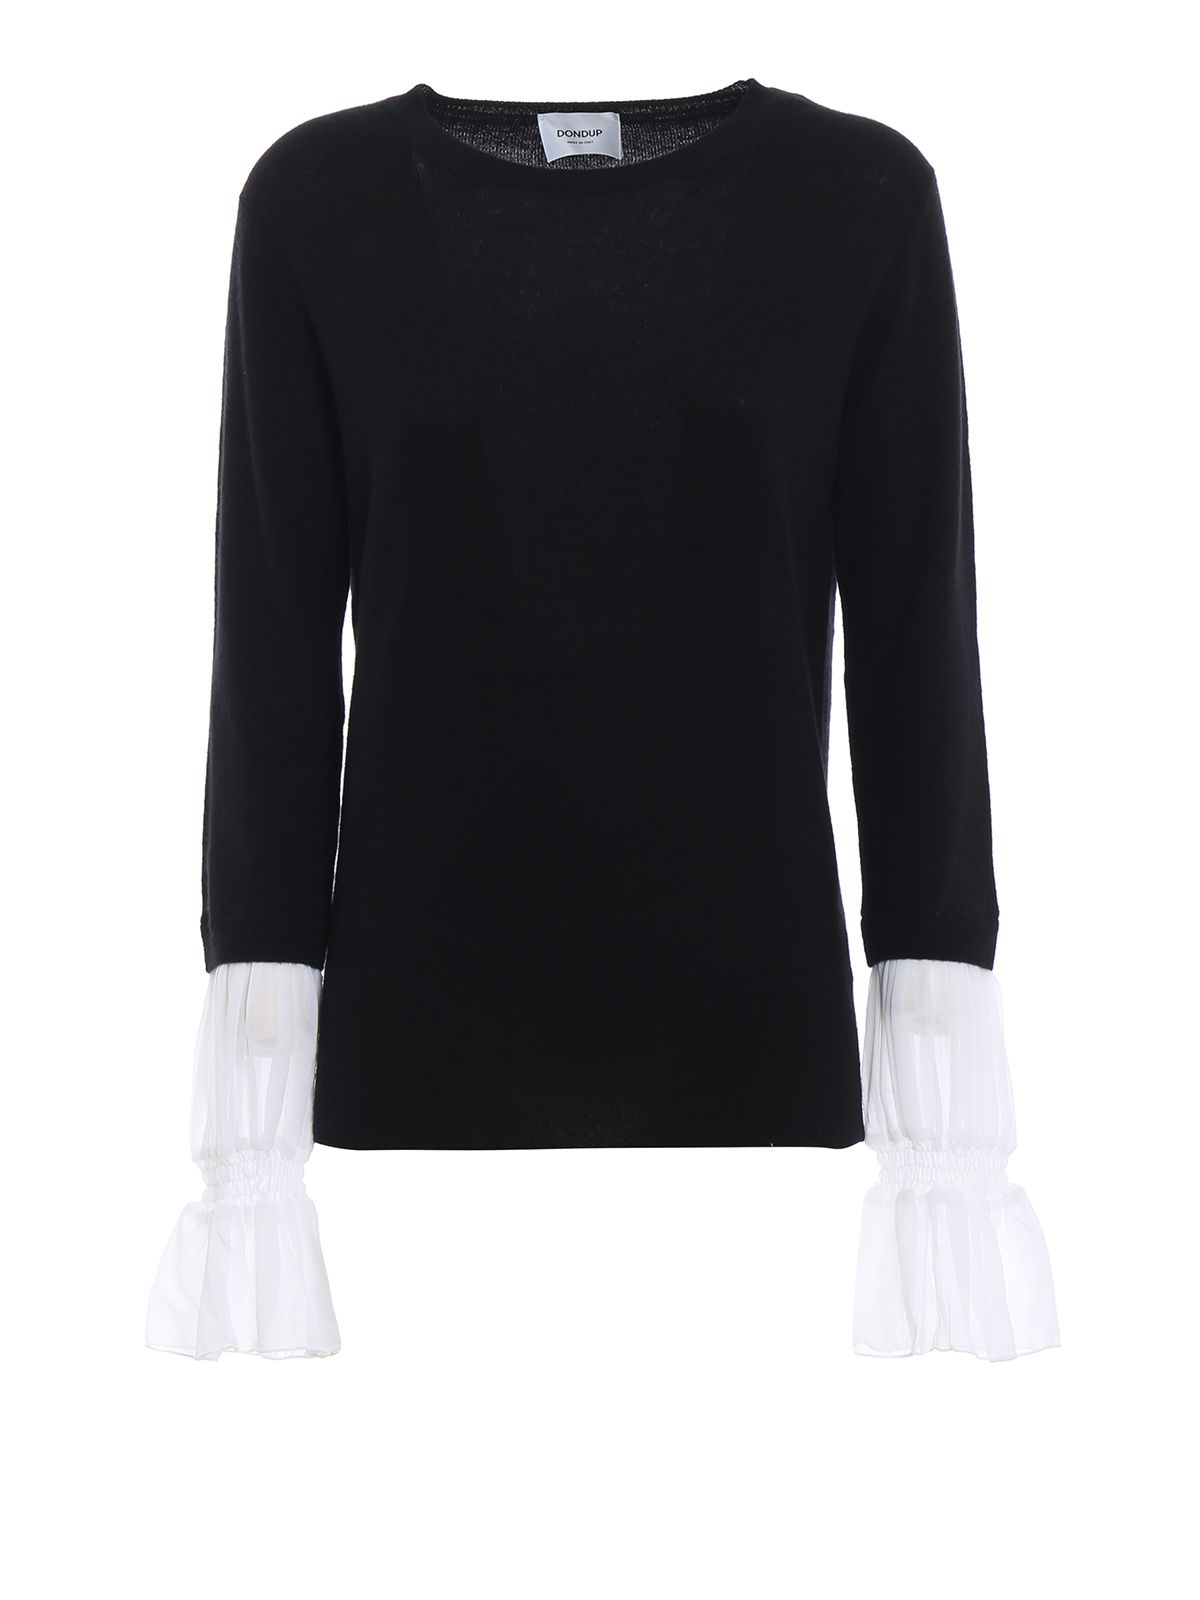 Dondup Georgette Cuff Merino And Cashmere Sweater